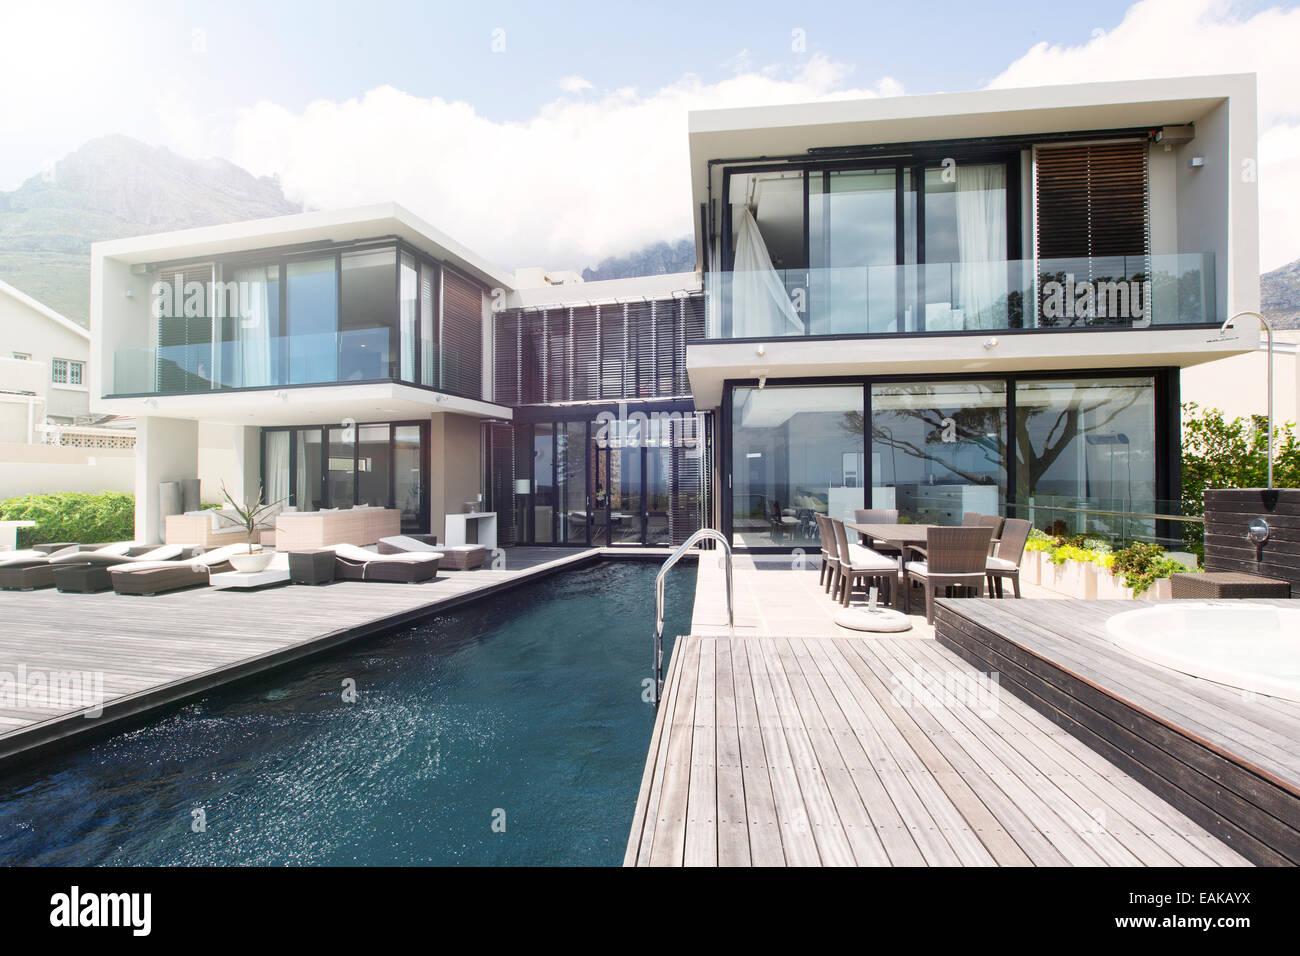 Maison Moderne Avec Grande Terrasse Et Piscine Banque D Images